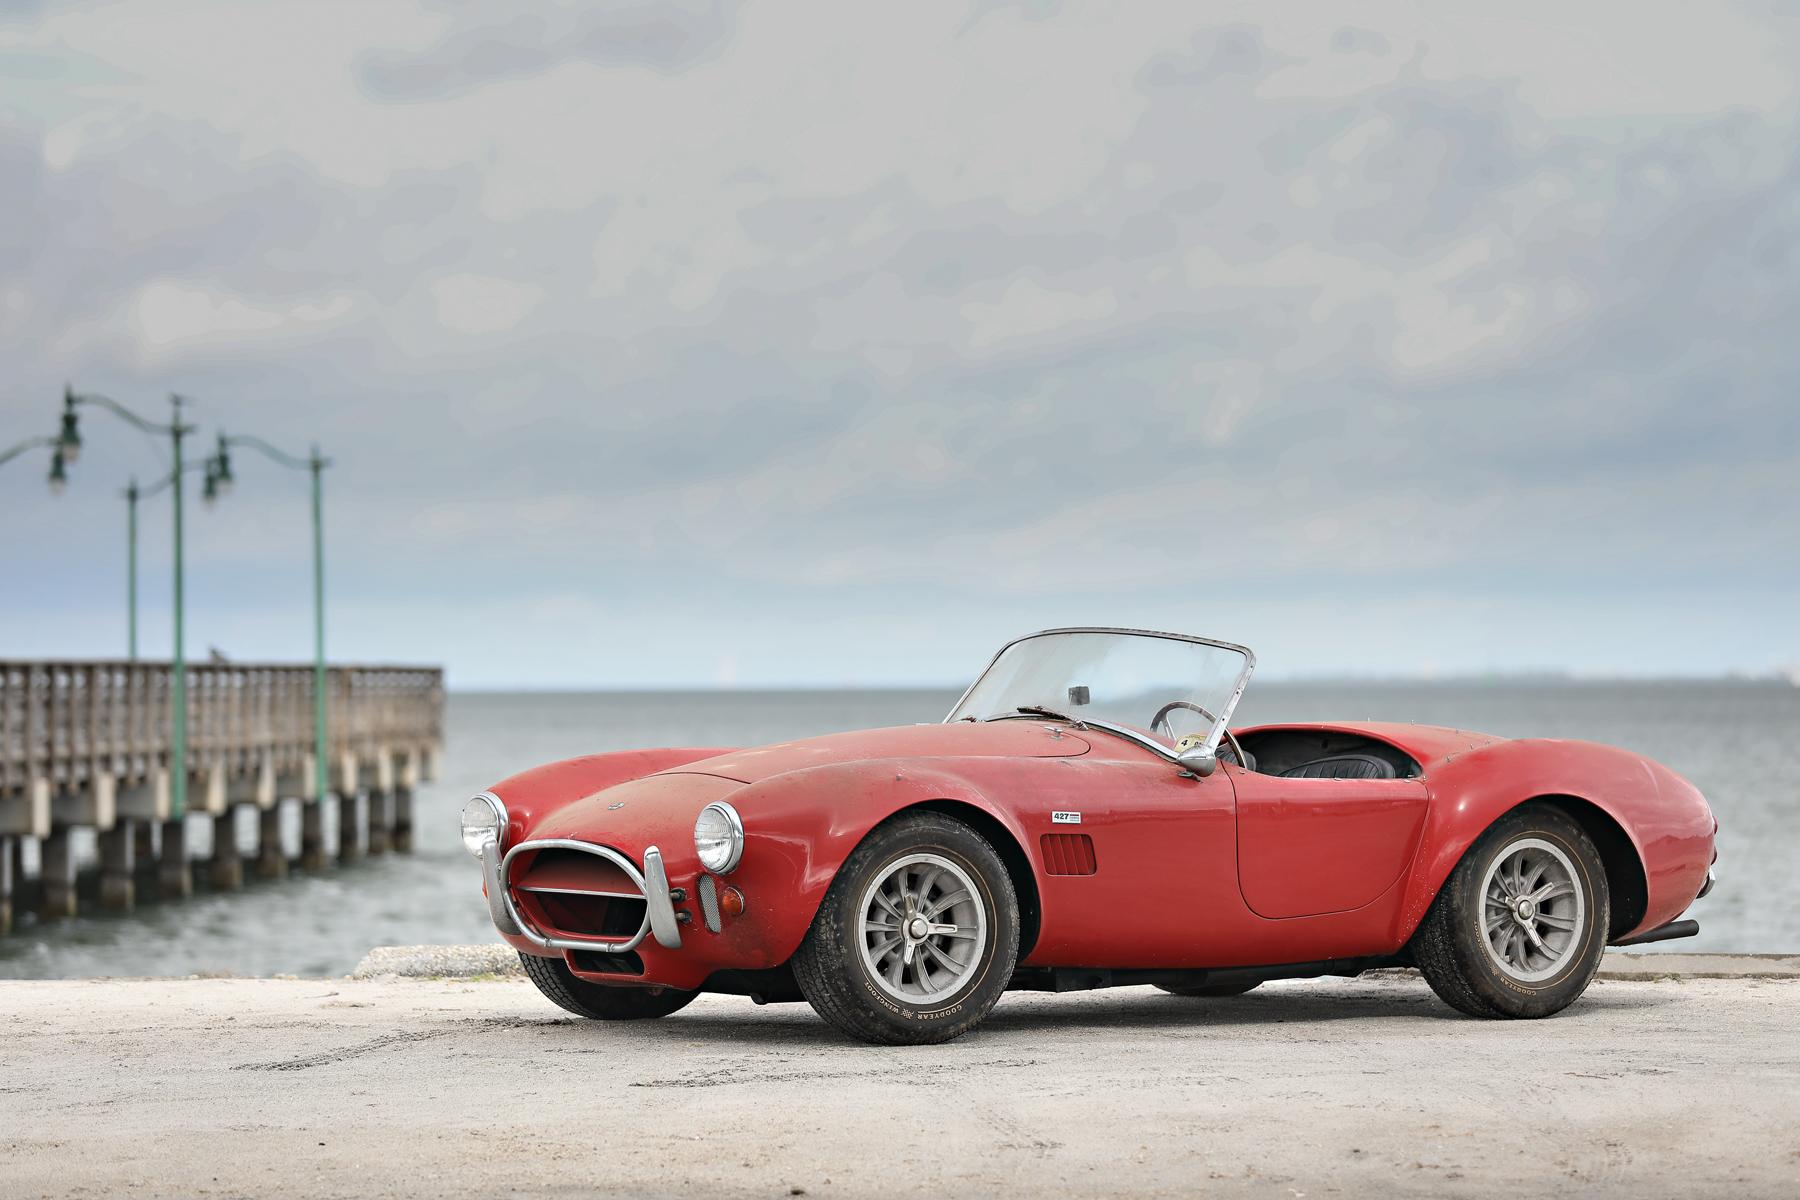 1966 Shelby Cobra 427 profile